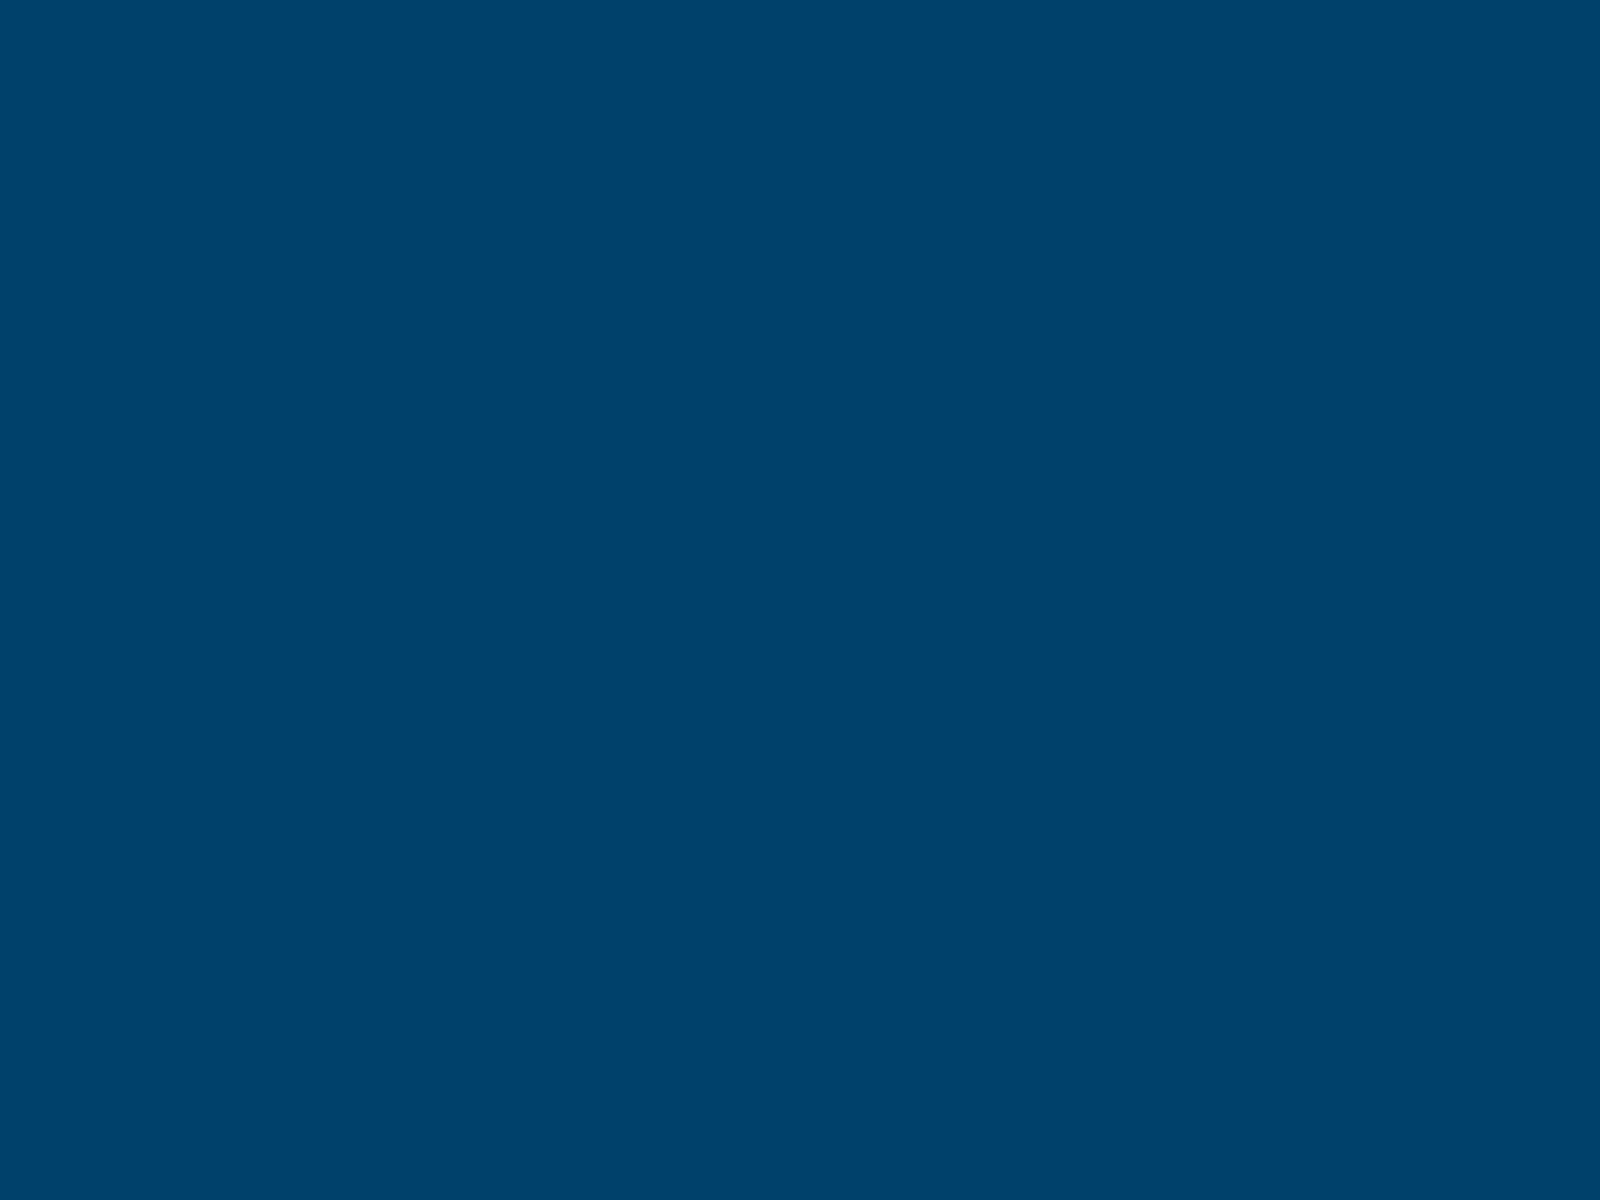 1600x1200 Indigo Dye Solid Color Background